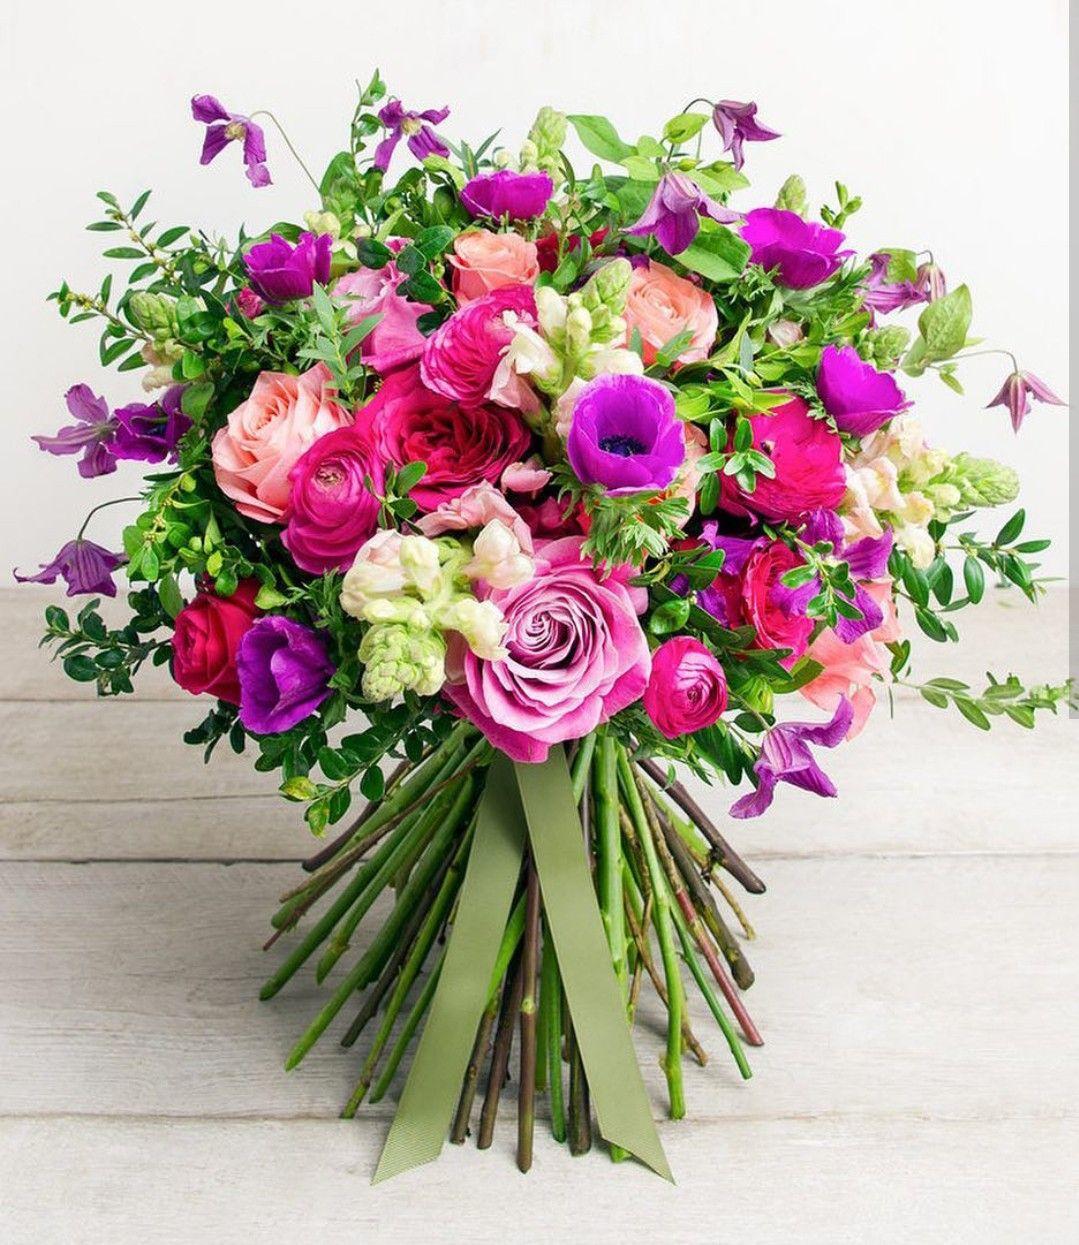 Pin by hester mowbrayclarke on Bouquets Pinterest Bouquet